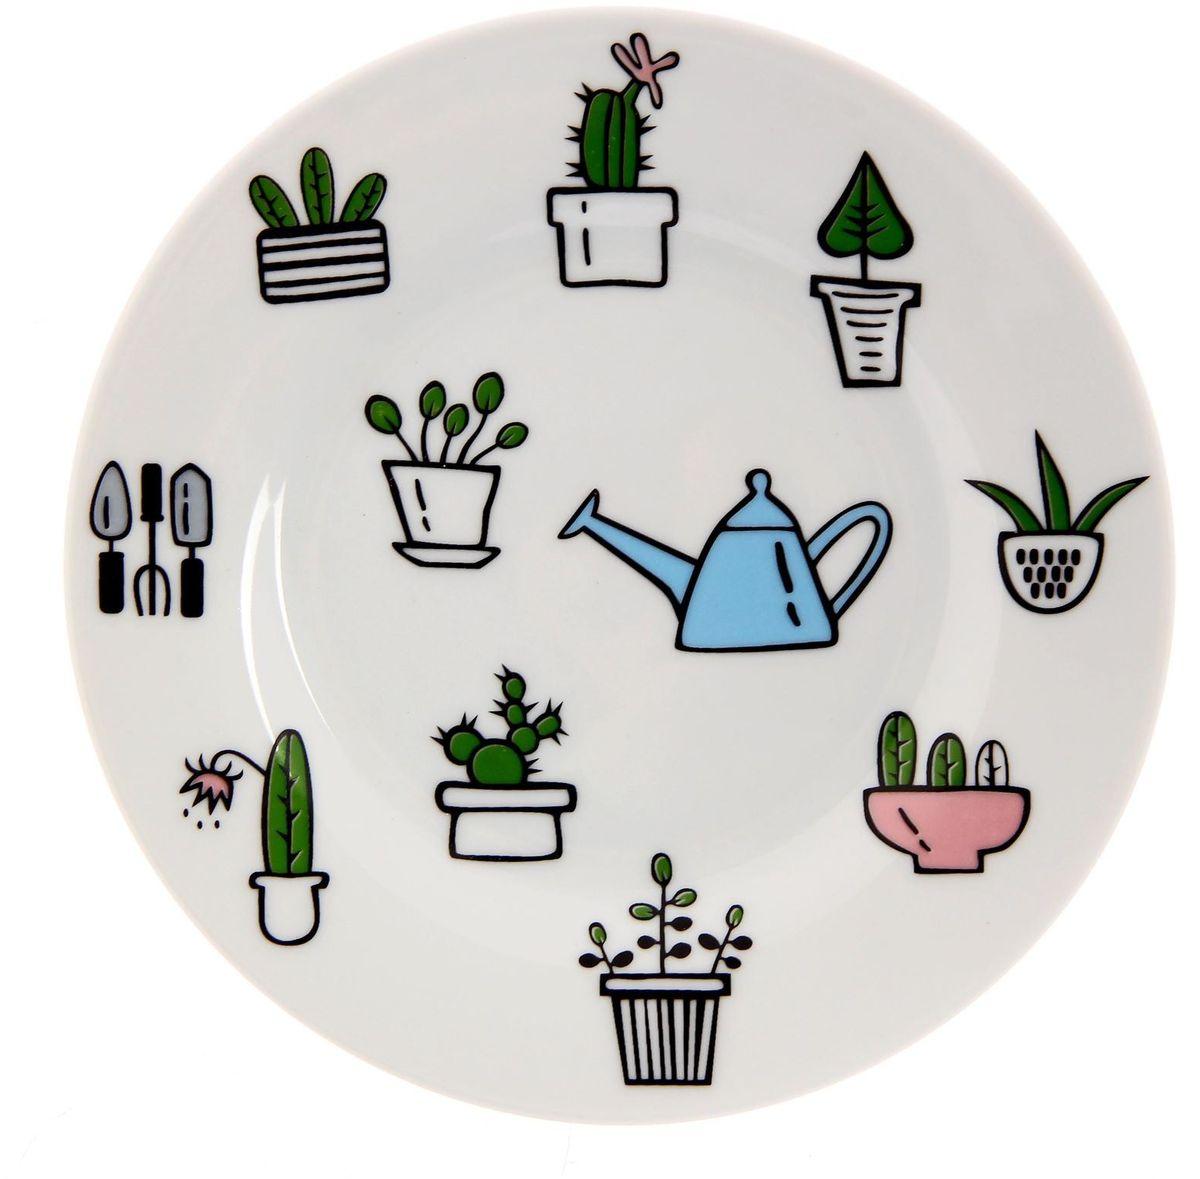 Тарелка мелкая Сотвори чудо Домашний сад, диаметр 15,5 см тарелка сотвори чудо киска диаметр 23 см